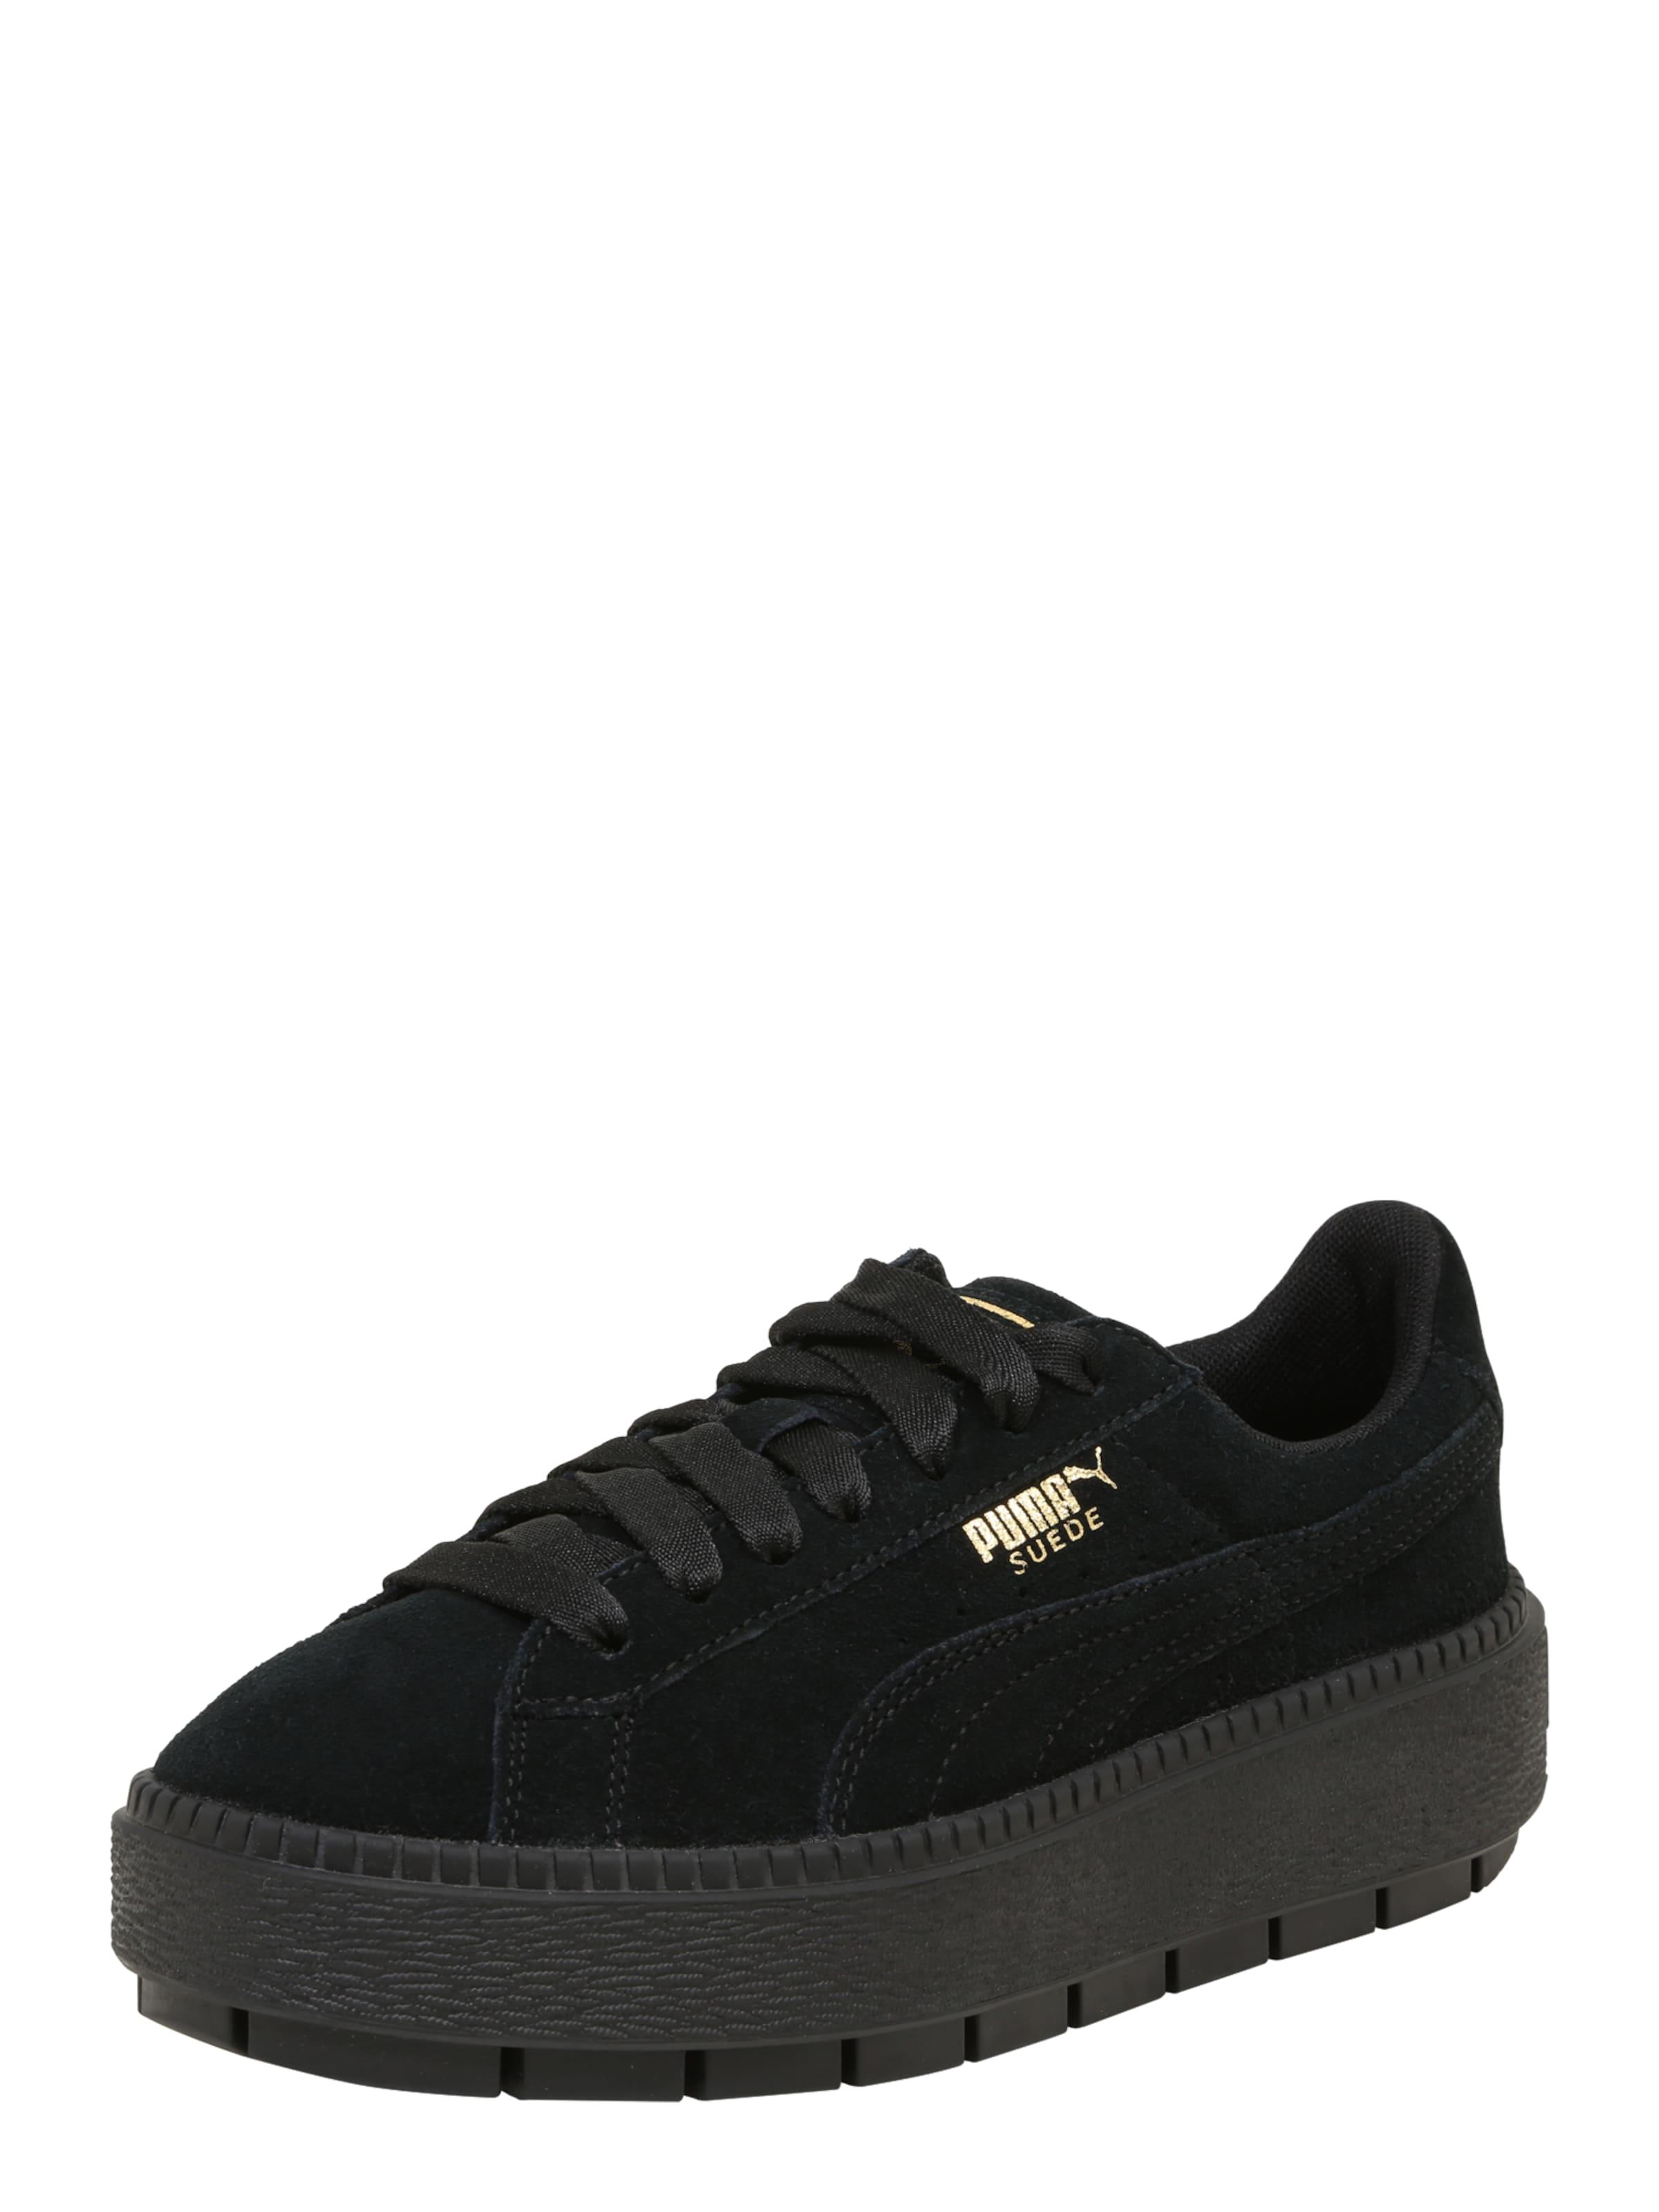 PUMA Sneaker 'Platform Trace' Steckdose Neue Stile urA1h